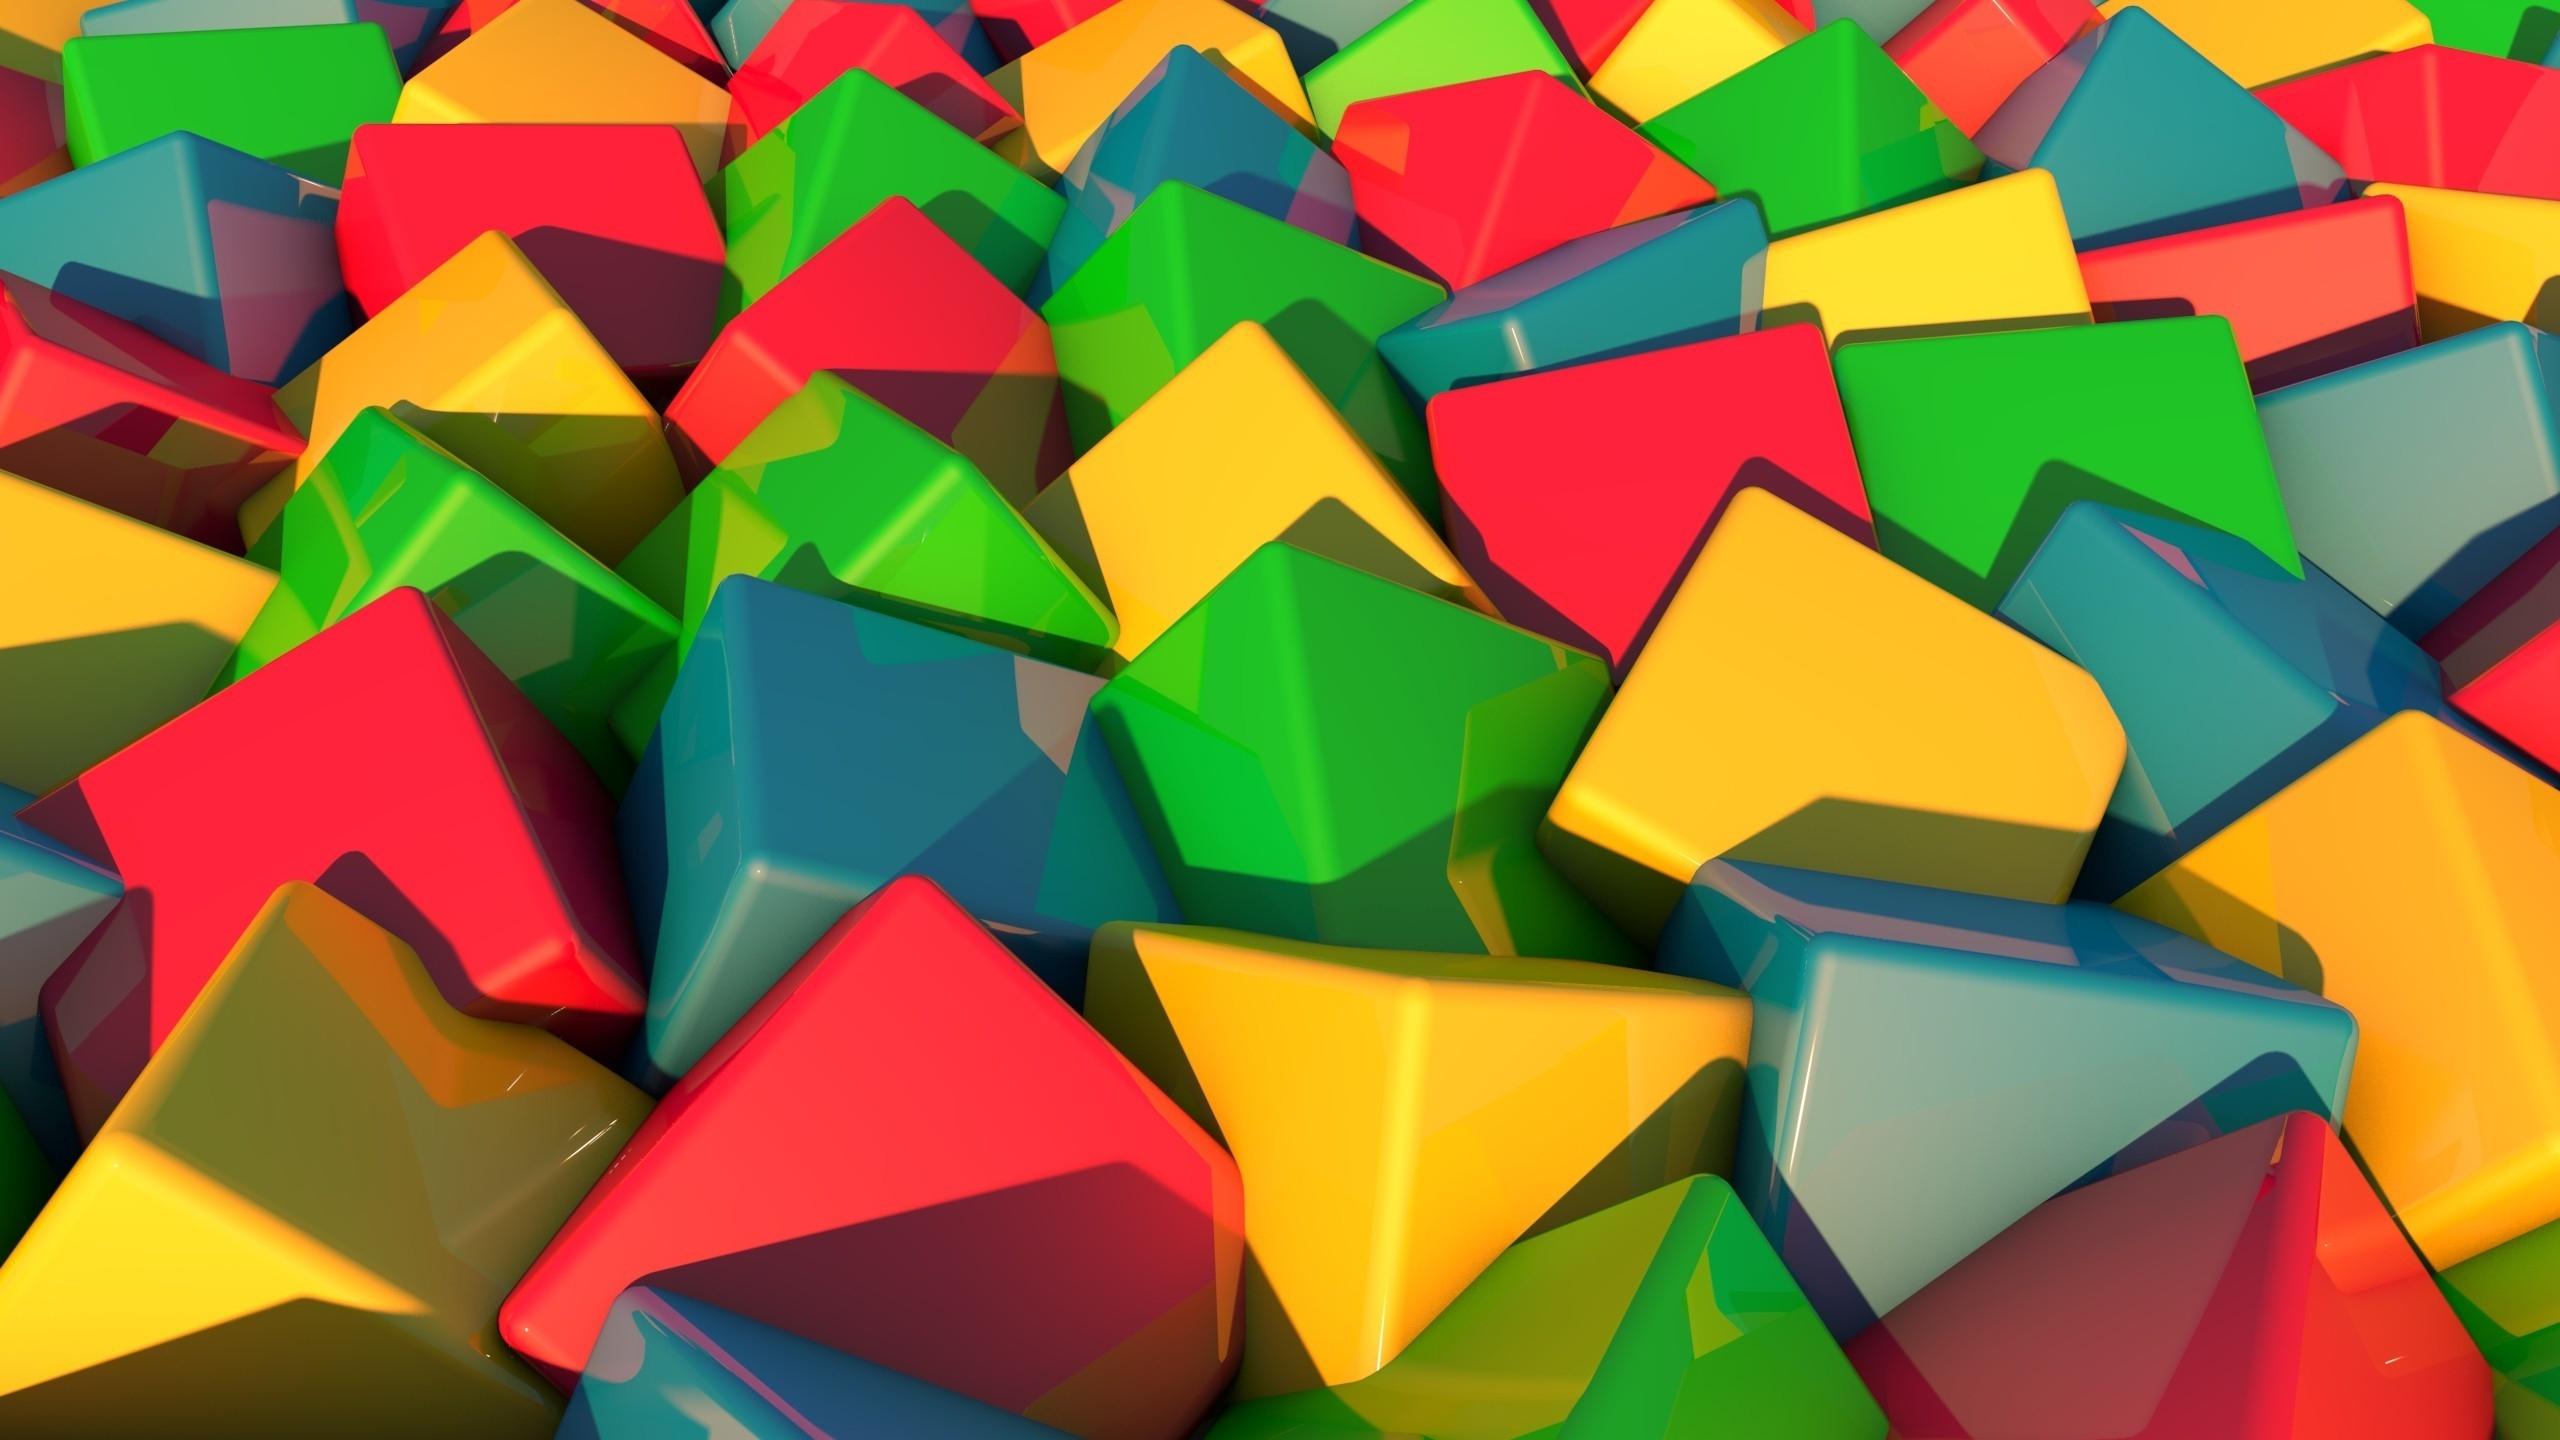 2560x1080 Blocks Many Color 2560x1080 Resolution Wallpaper Hd